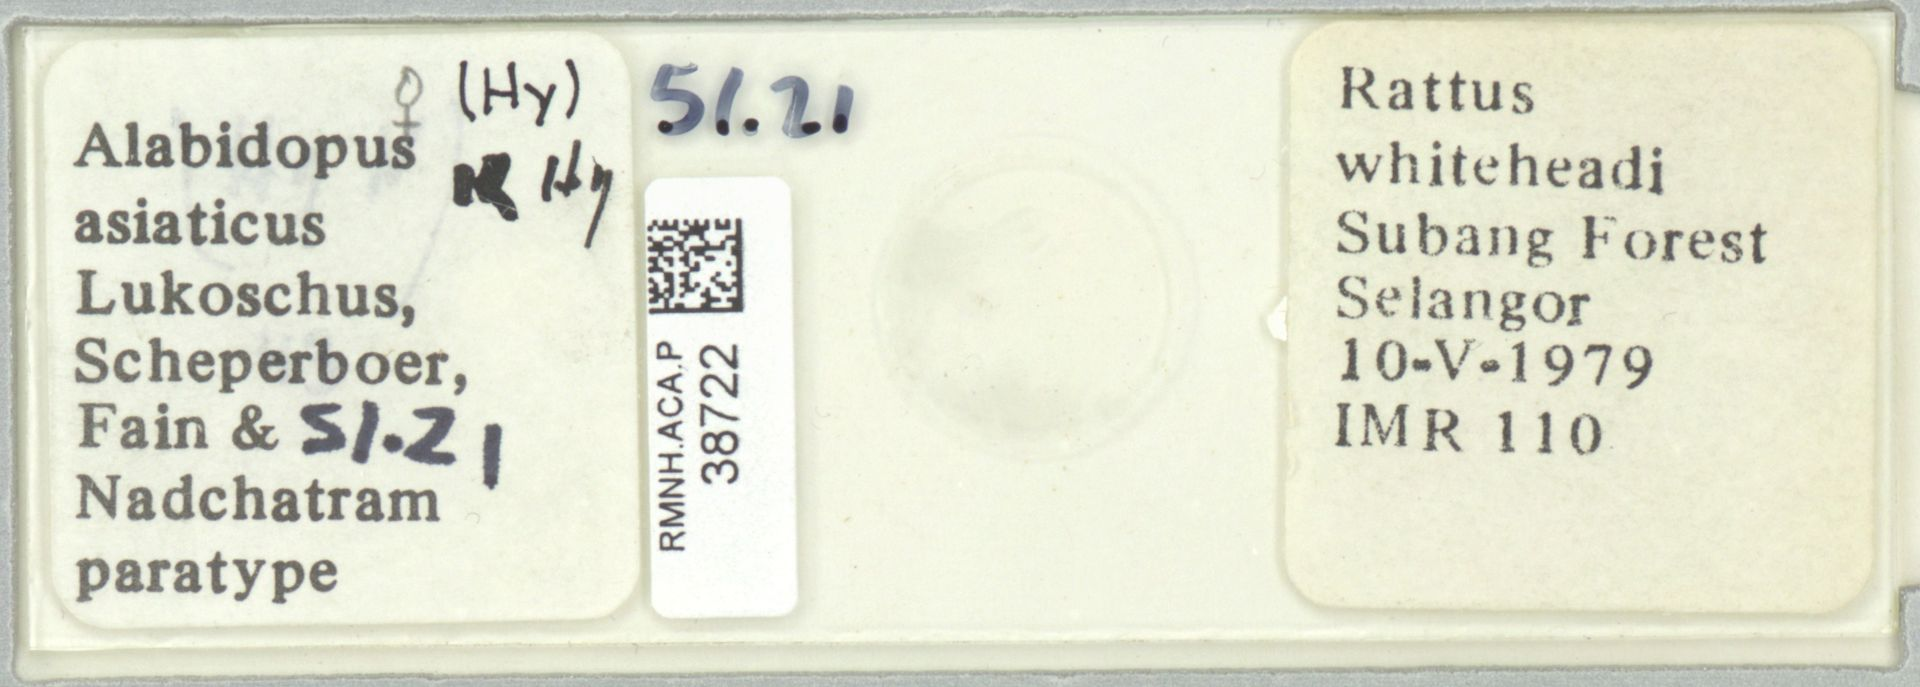 RMNH.ACA.P.38722 | Alabidopus asiaticus Lukoschus, Scheperboer, Fain & Nadchatram